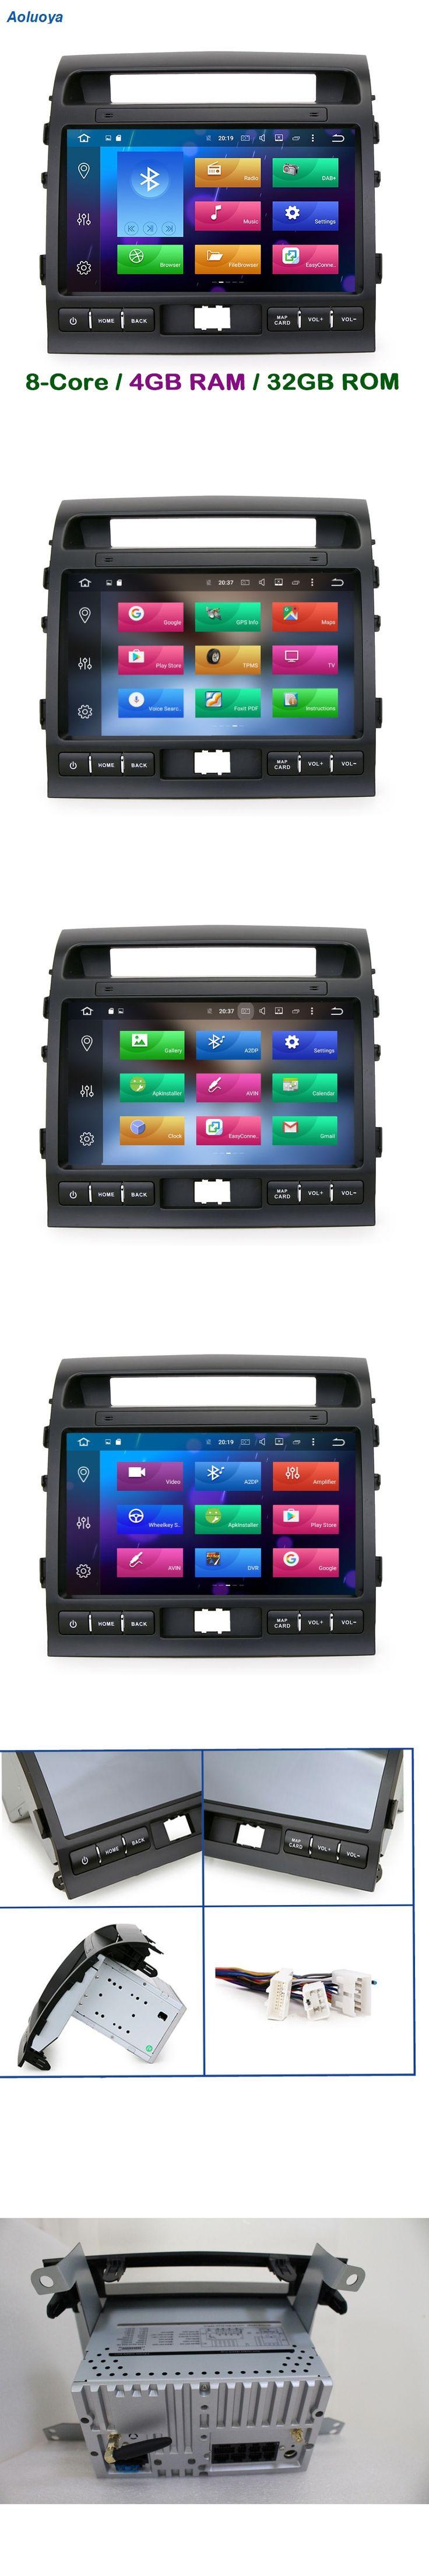 Aoluoya RAM 4GB Octa Core Android 6.0.1 CAR DVD GPS Player For Toyota Land Cruiser 200 LC200 2008-2015 Radio Navigation WIFI DAB